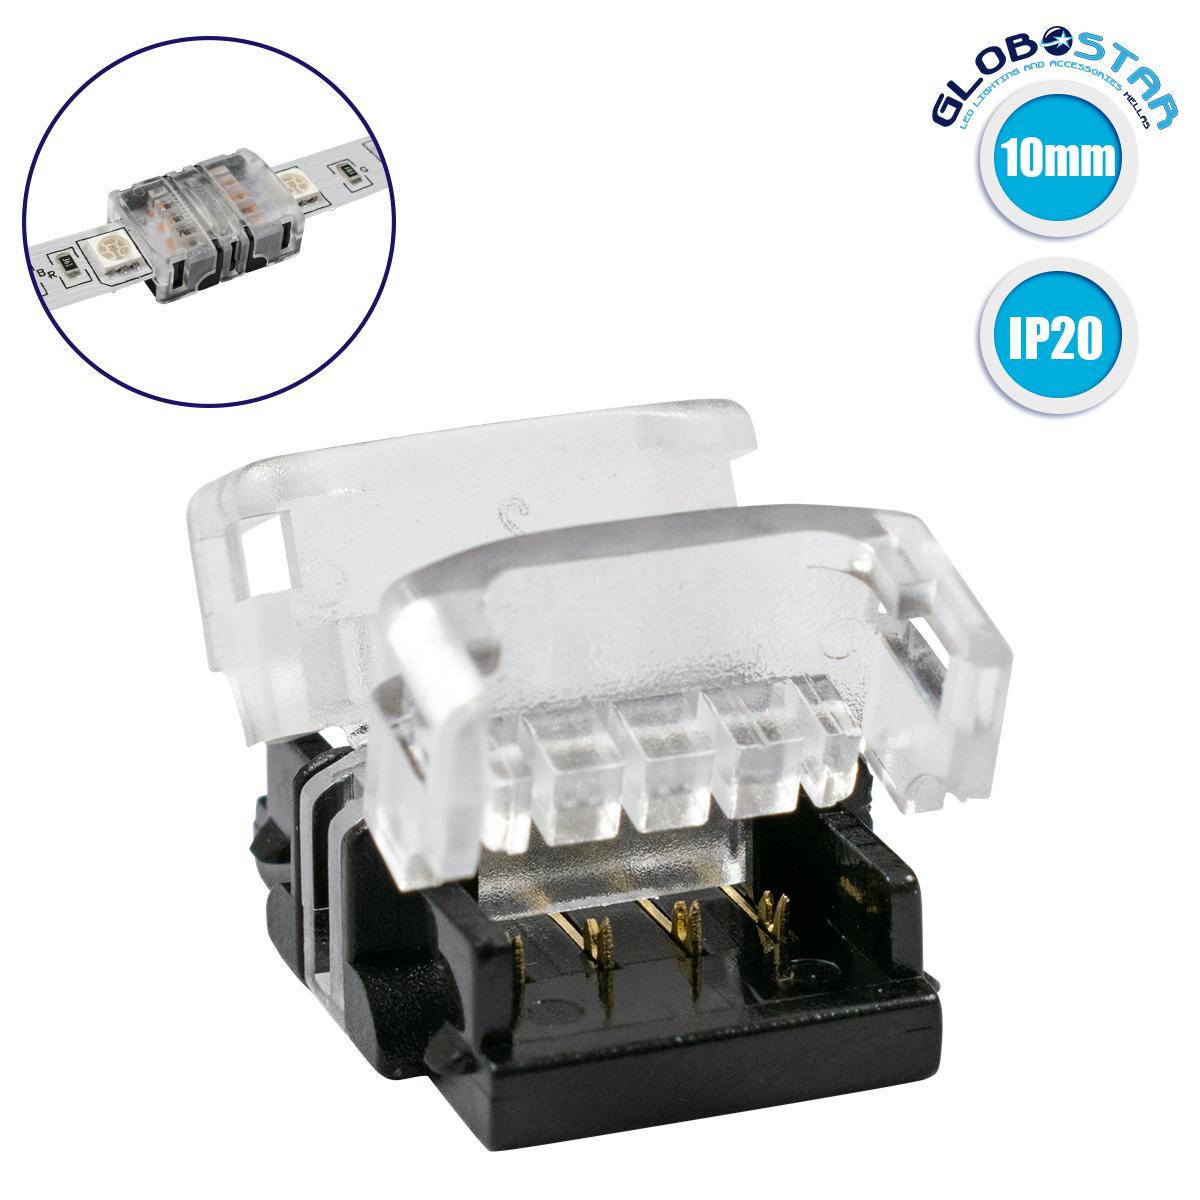 GloboStar® 70721 Ταχυσύνδεσμος Ένωσης IP20 - Strip To Strip Connector για Ένωση 2 x RGB Ταινίες LED Πλάτους 10mm